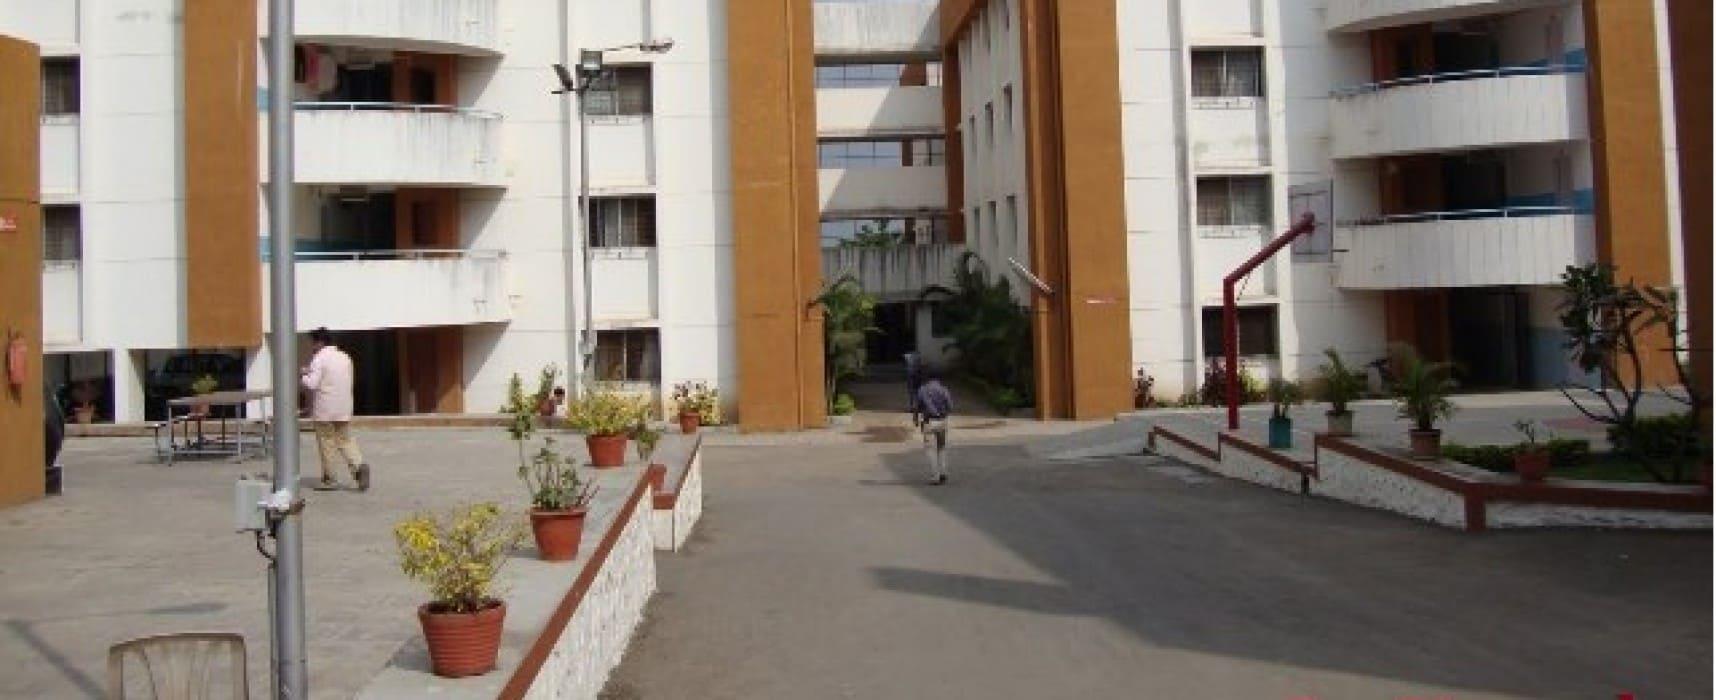 Hostel 101